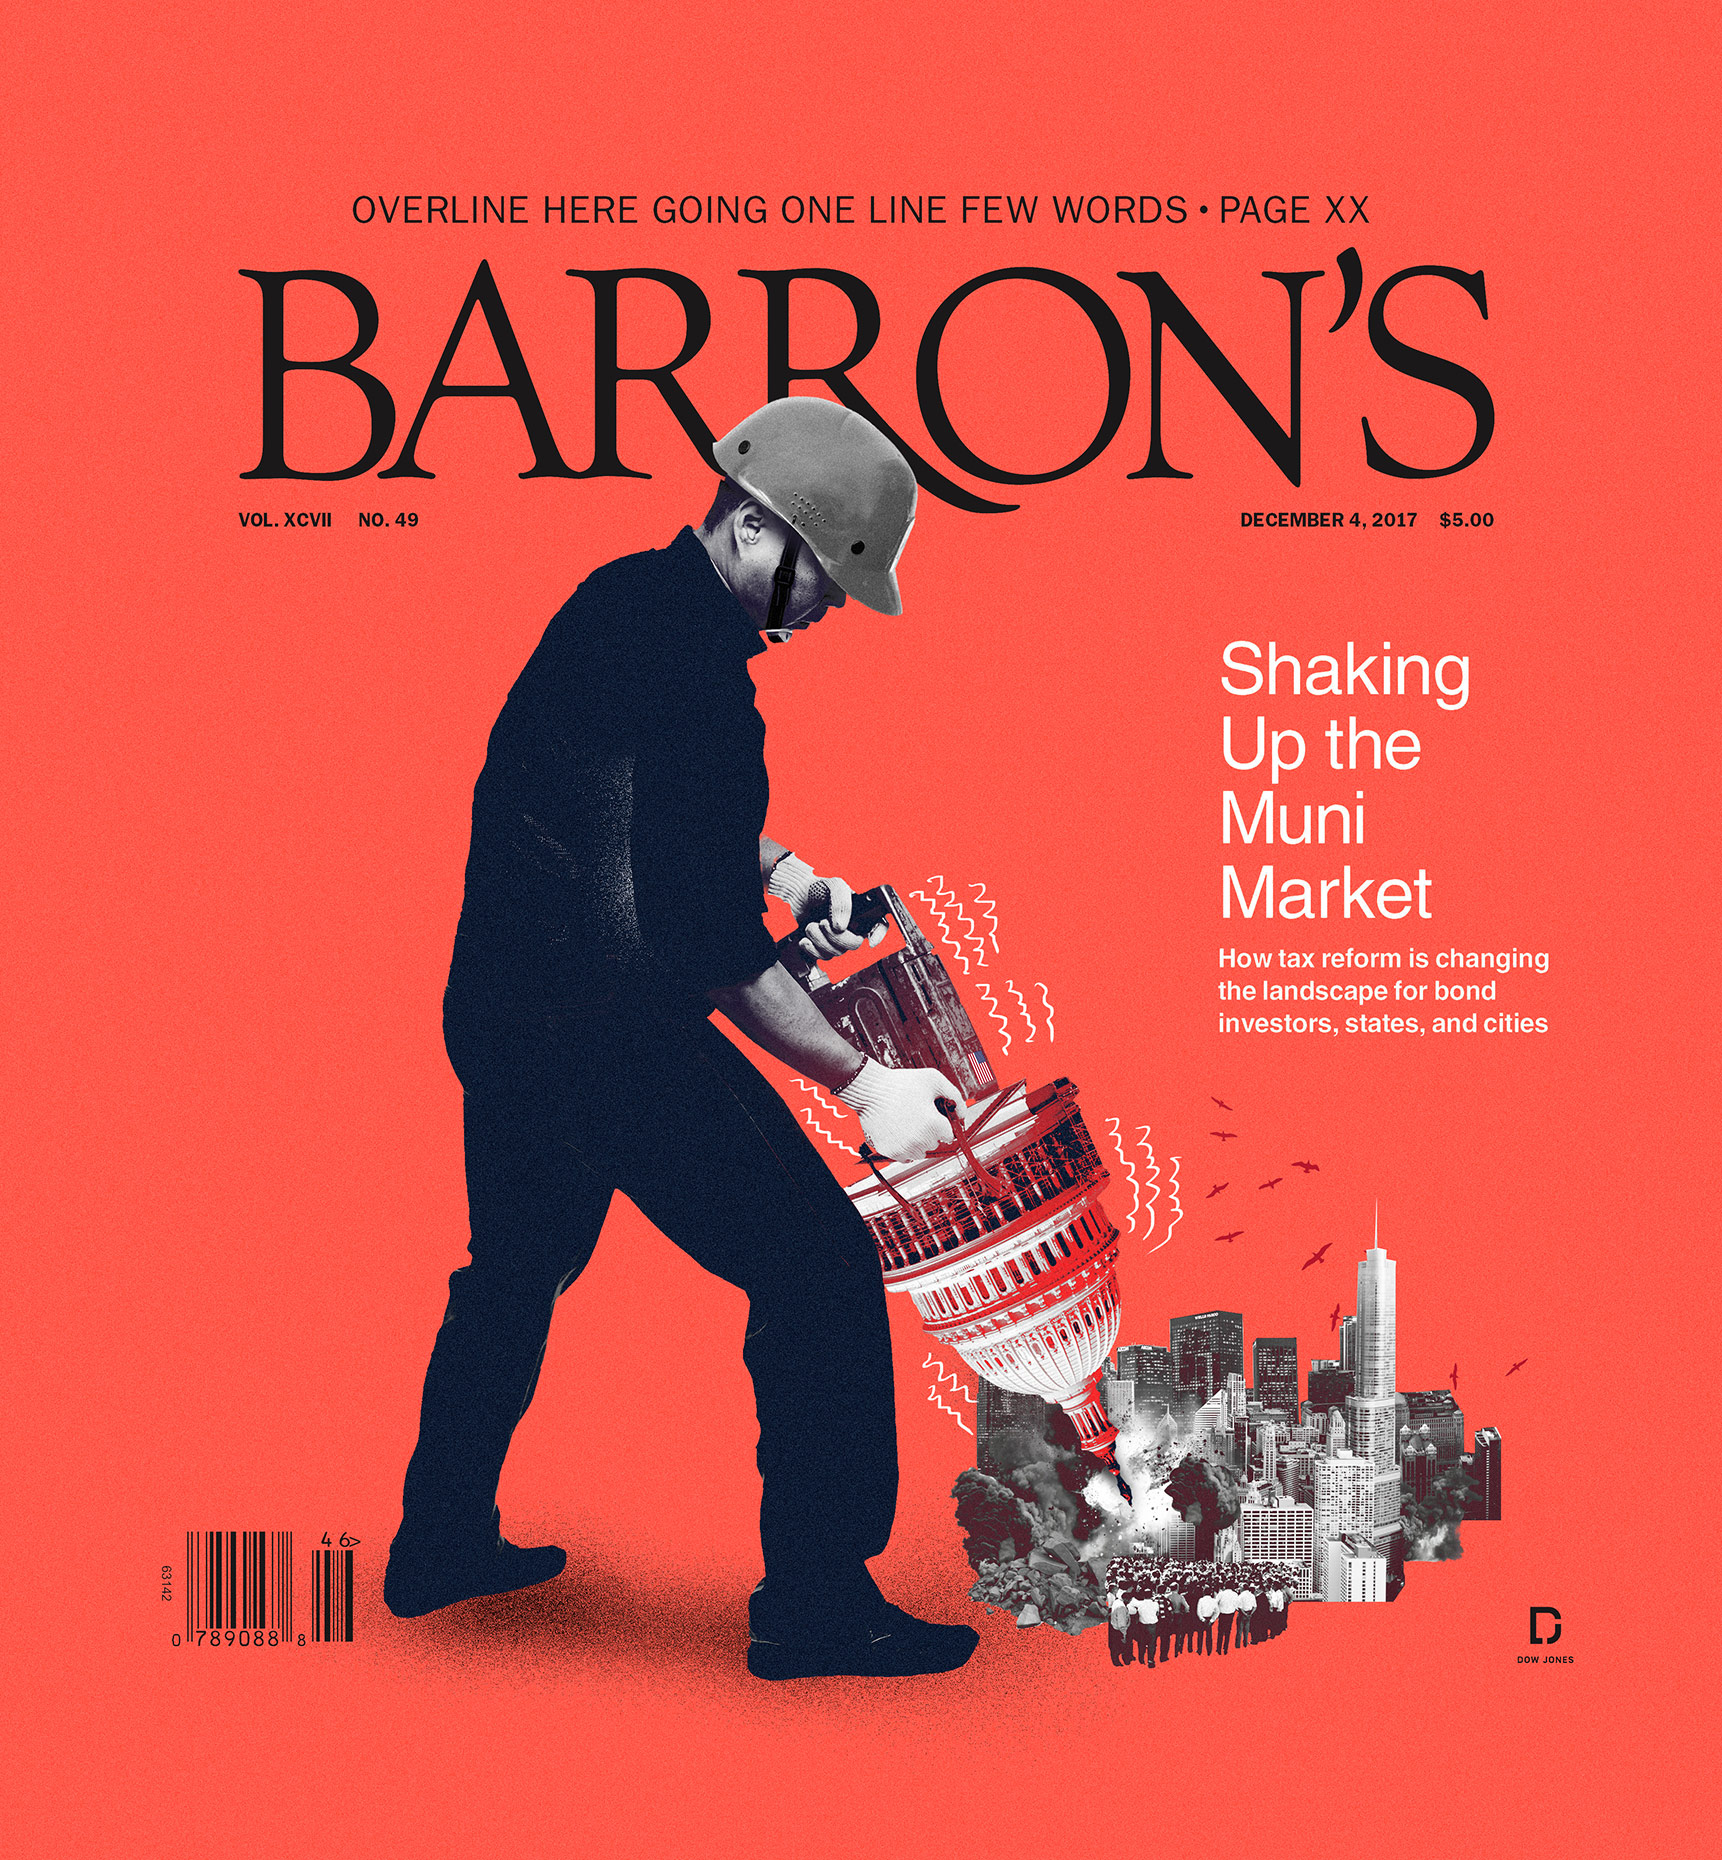 Barrons_CVR_Maxomatic-FINAL.jpg